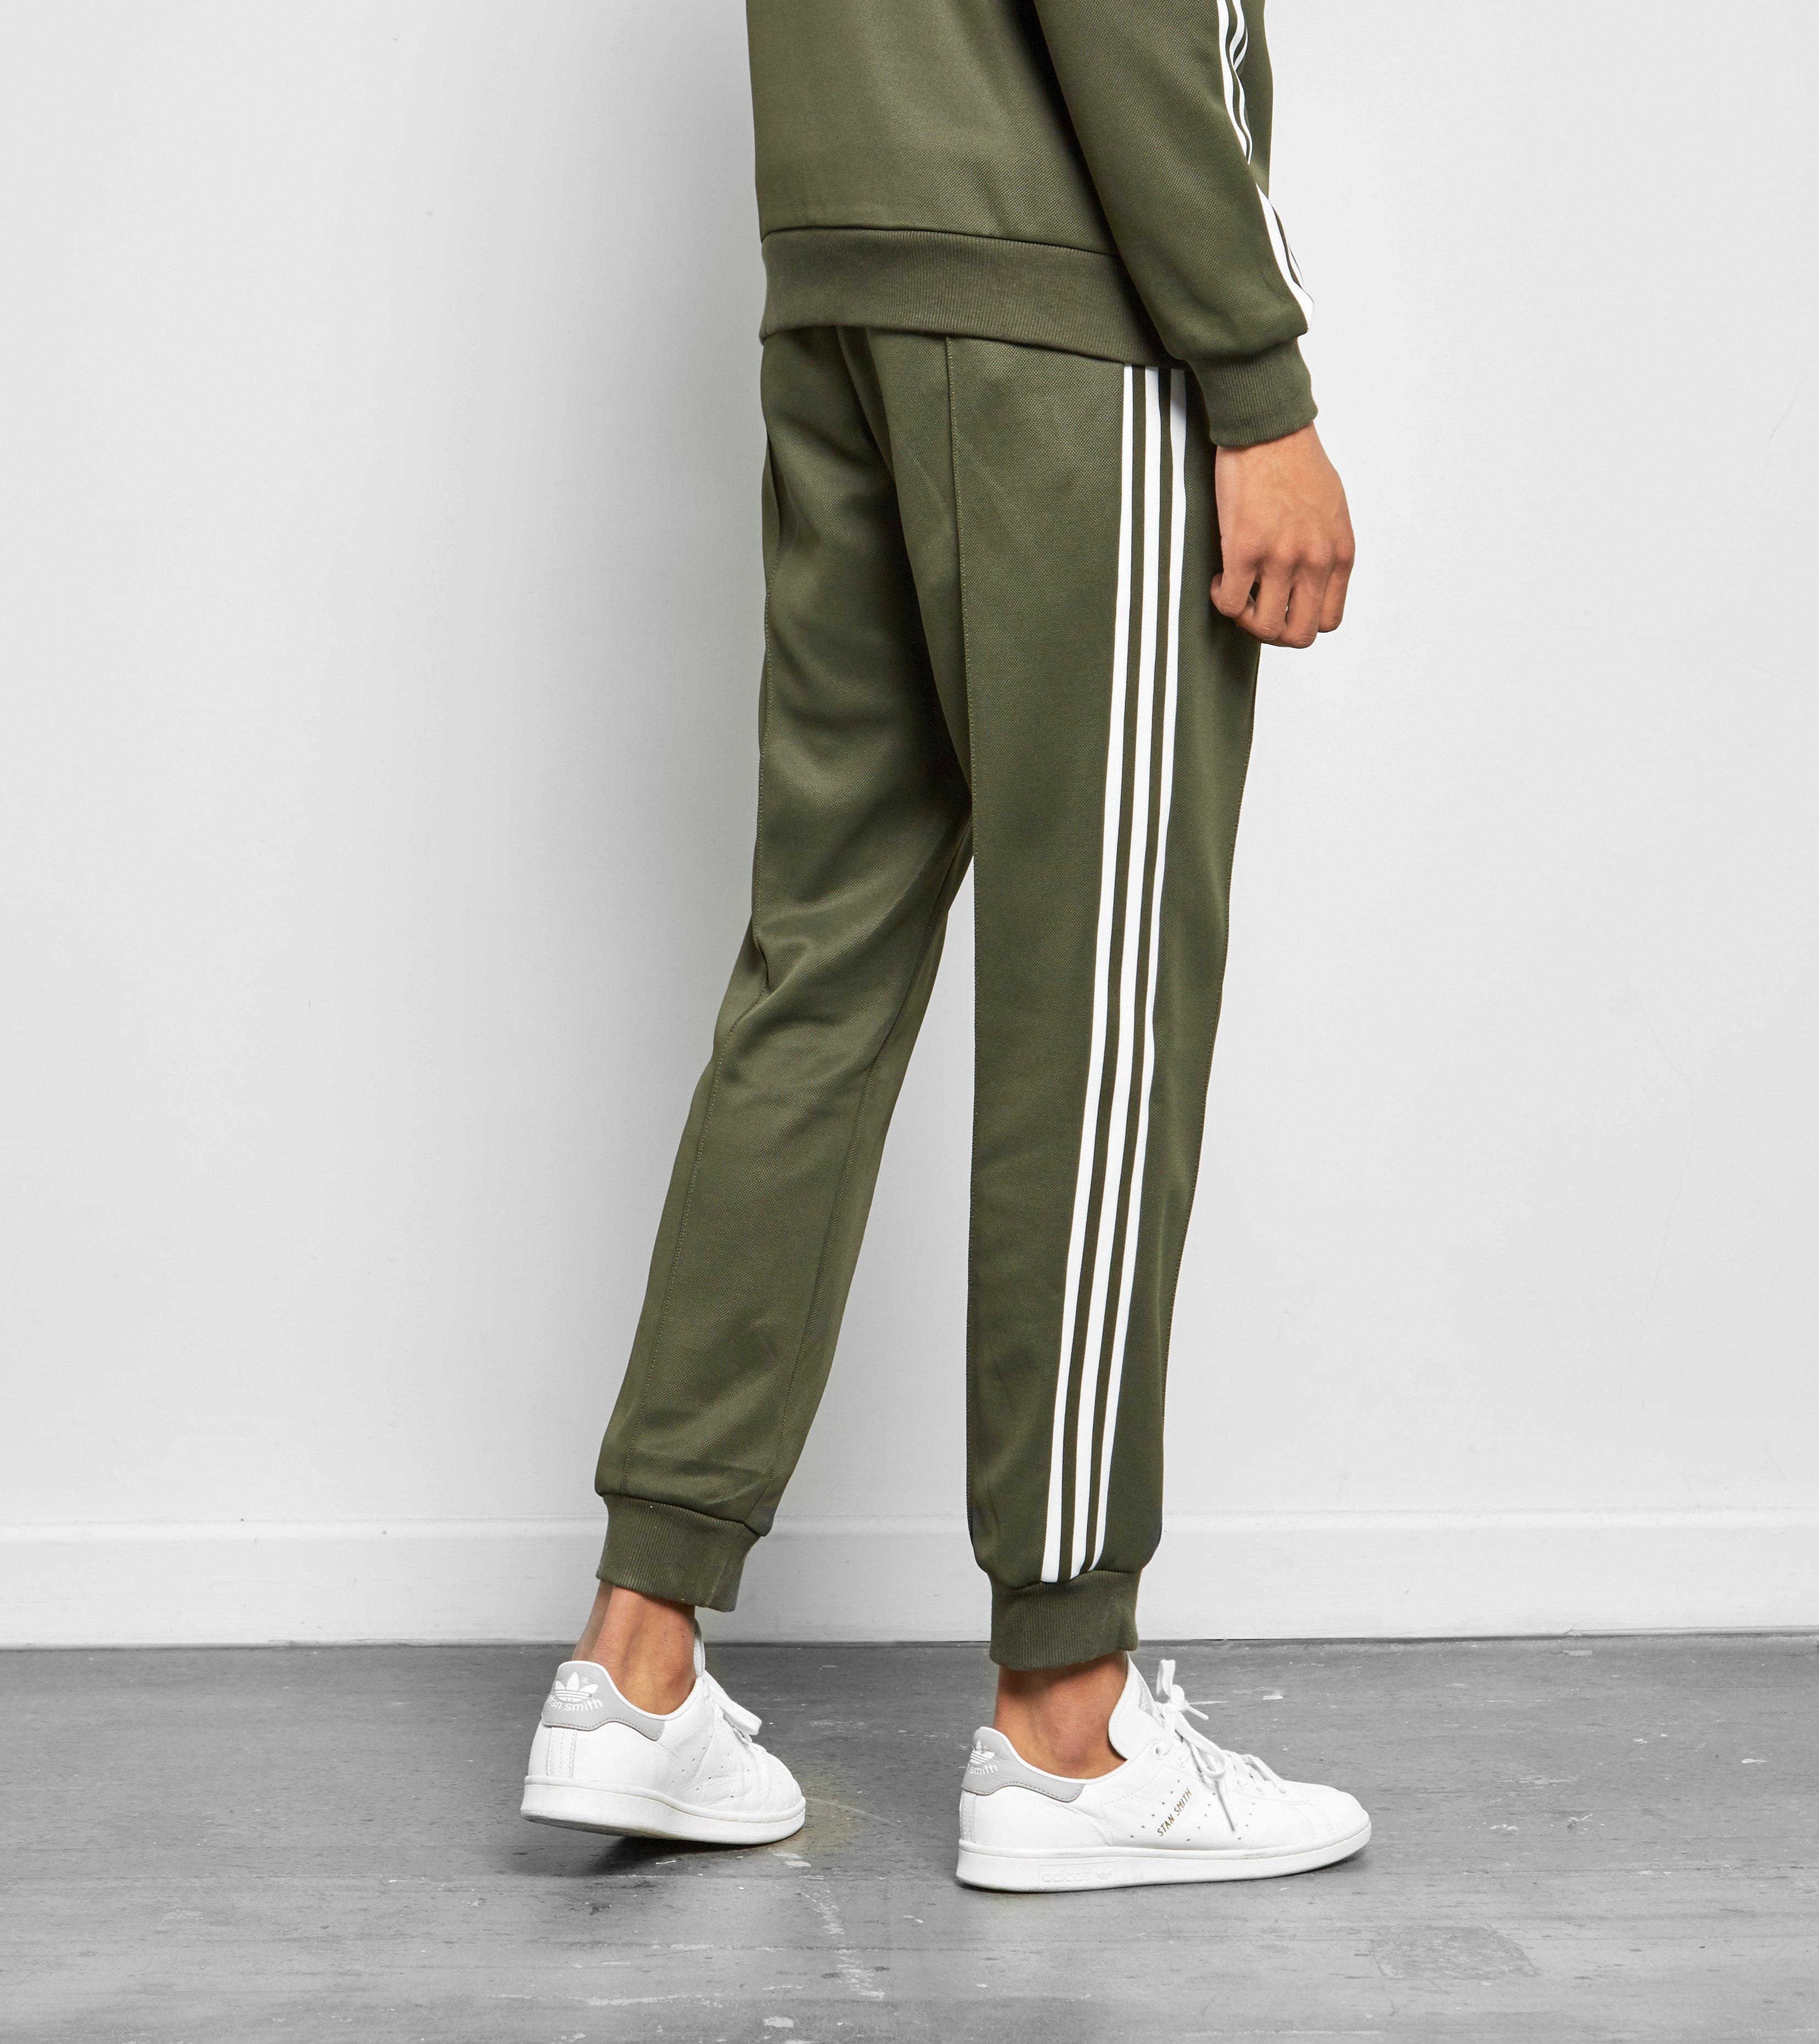 adidas Originals Cntp Track Pants Size? Exclusive in Green